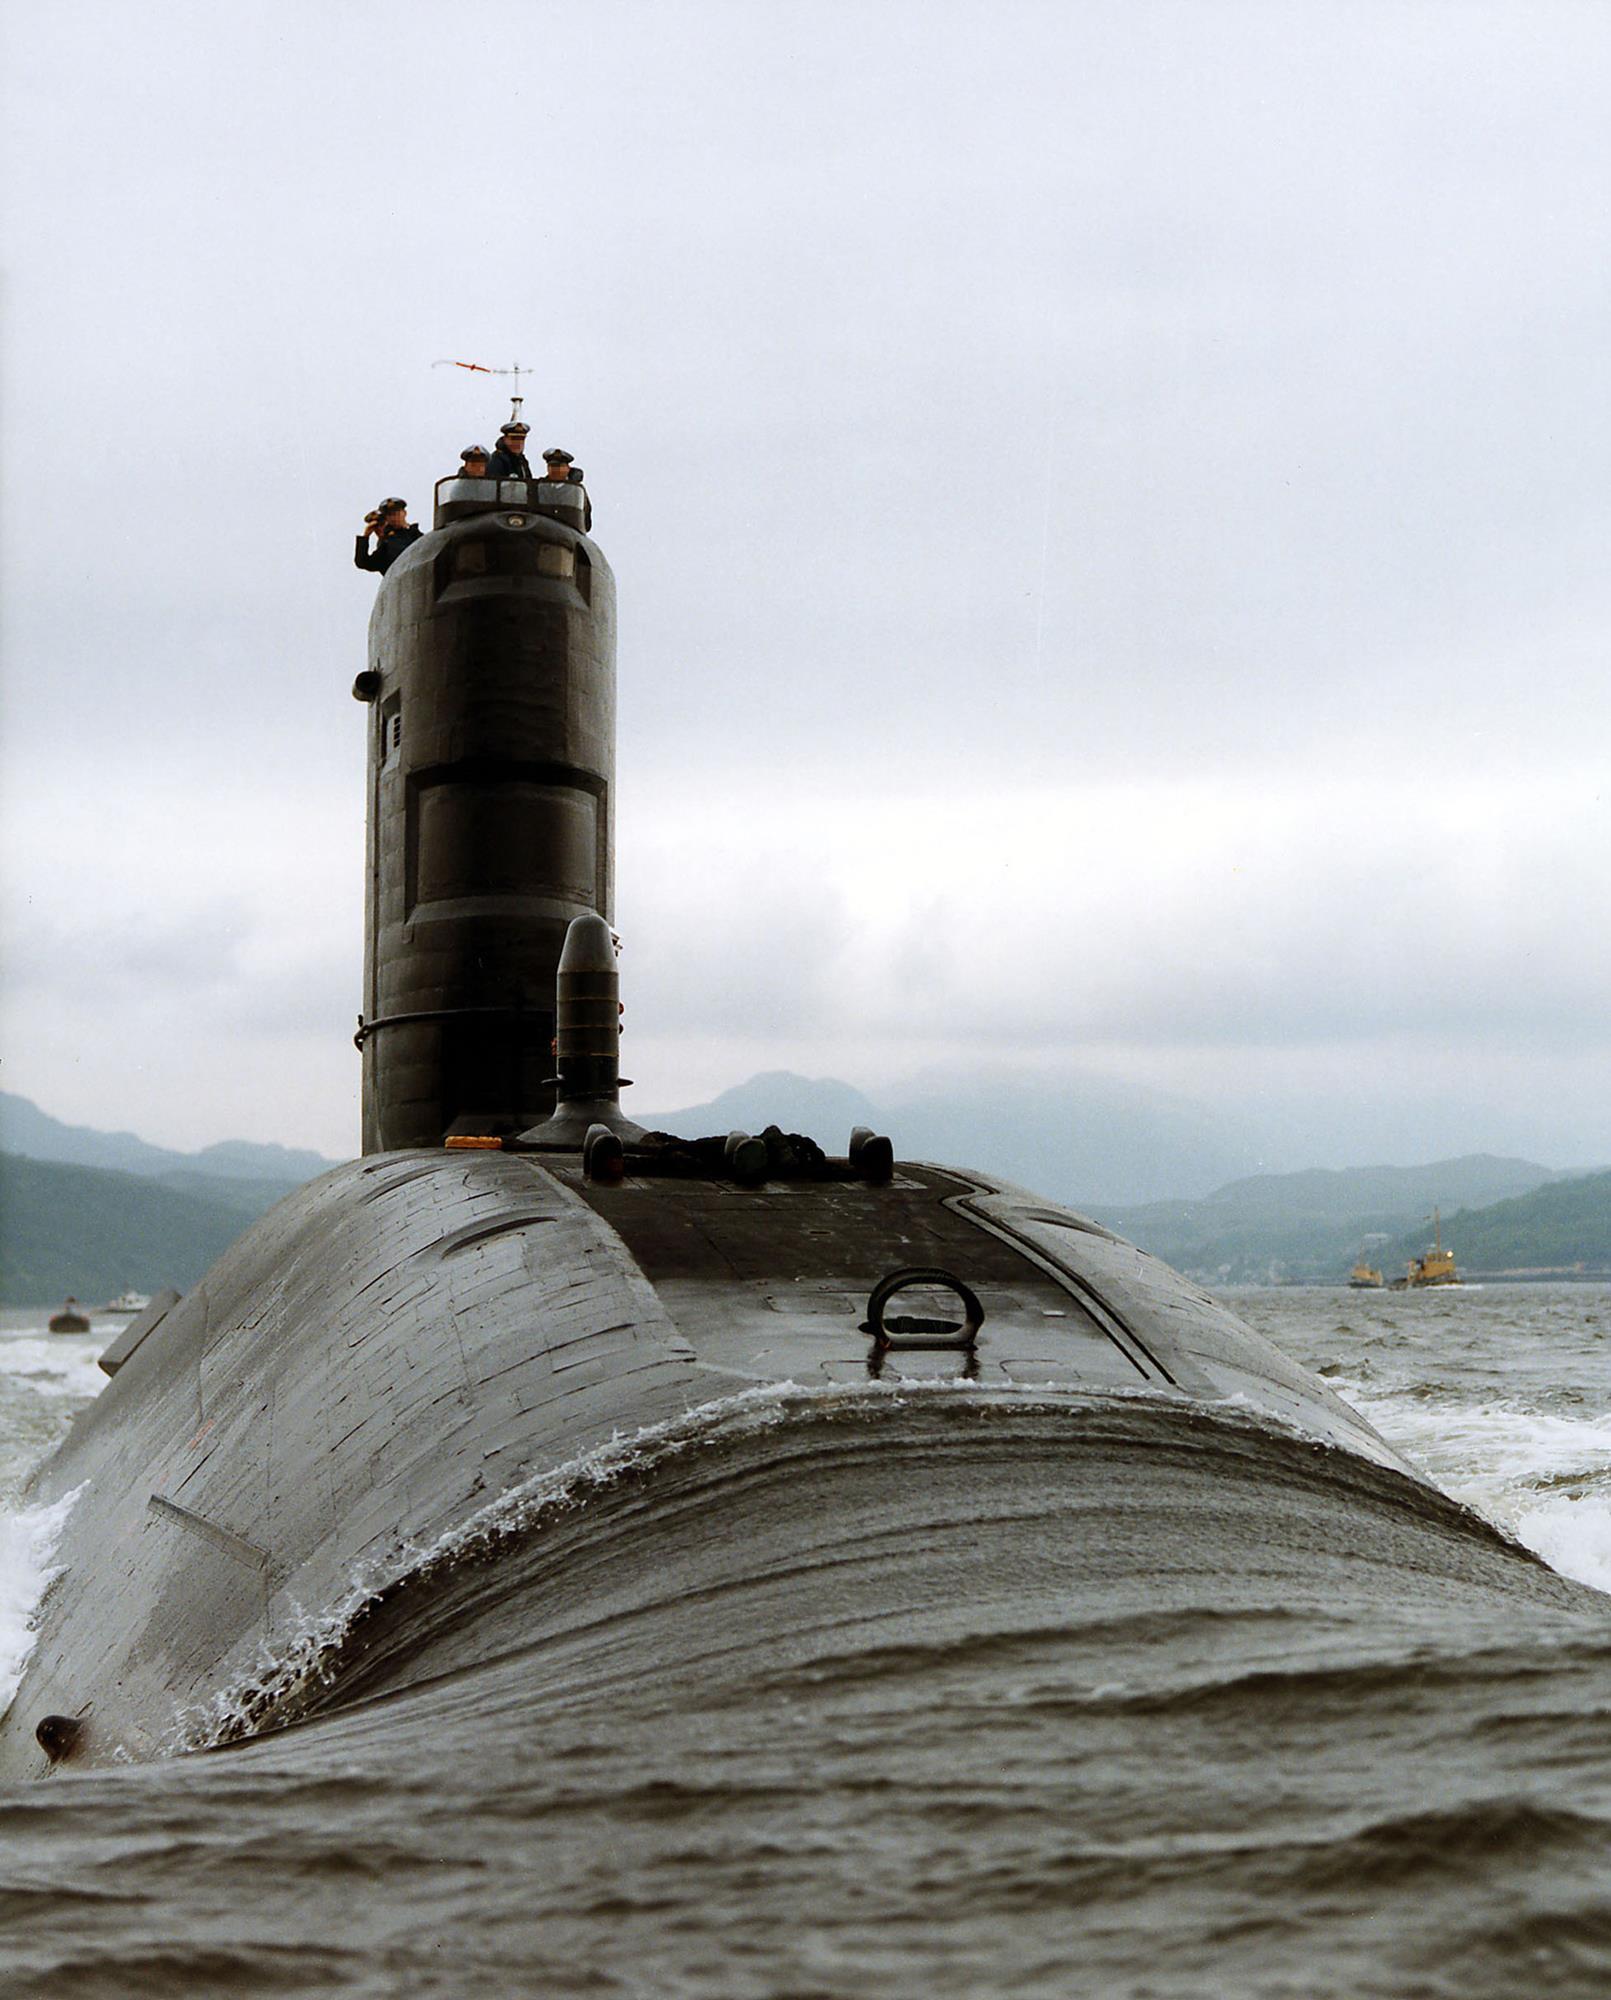 How do you scrap a nuclear submarine? | News | Chemistry World